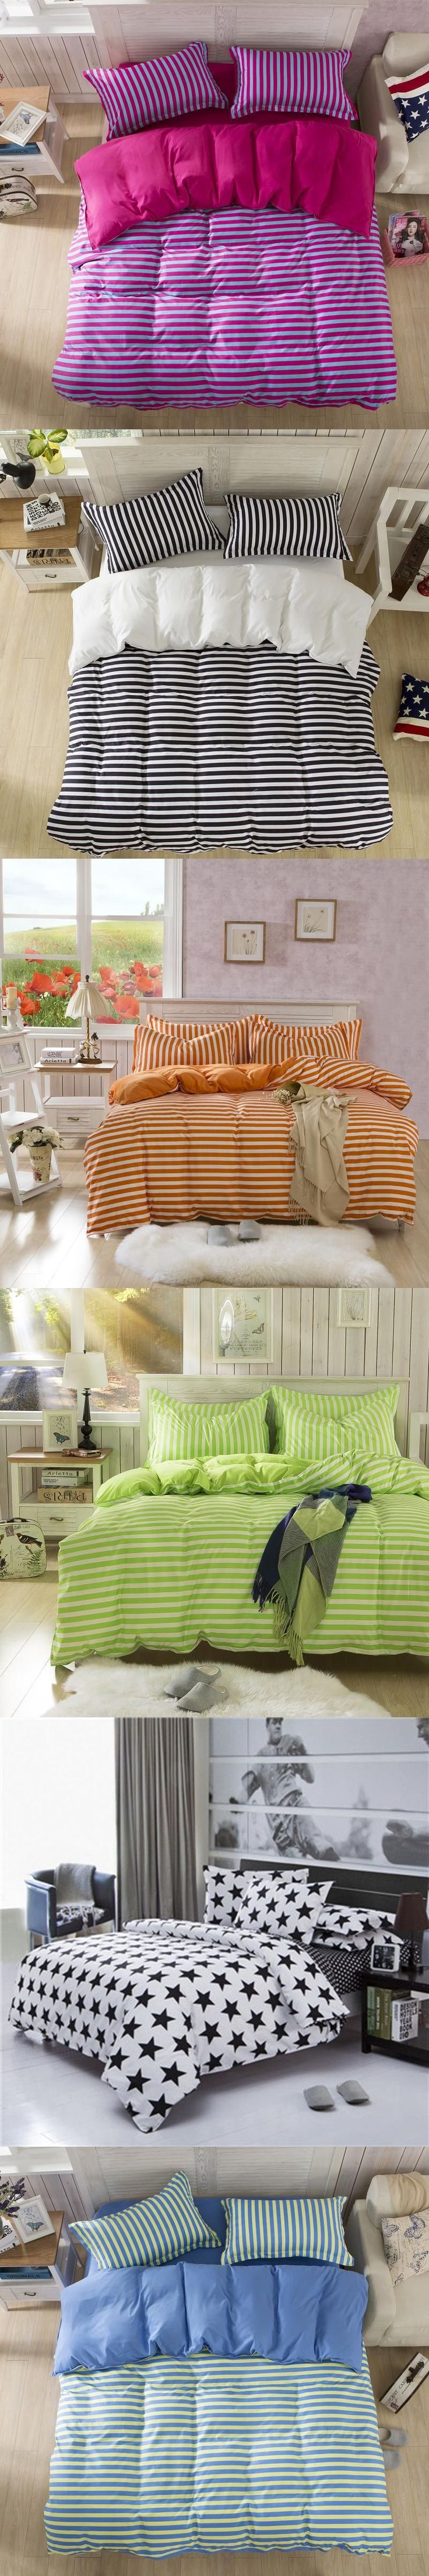 Best 25 Modern bed sheets ideas on Pinterest